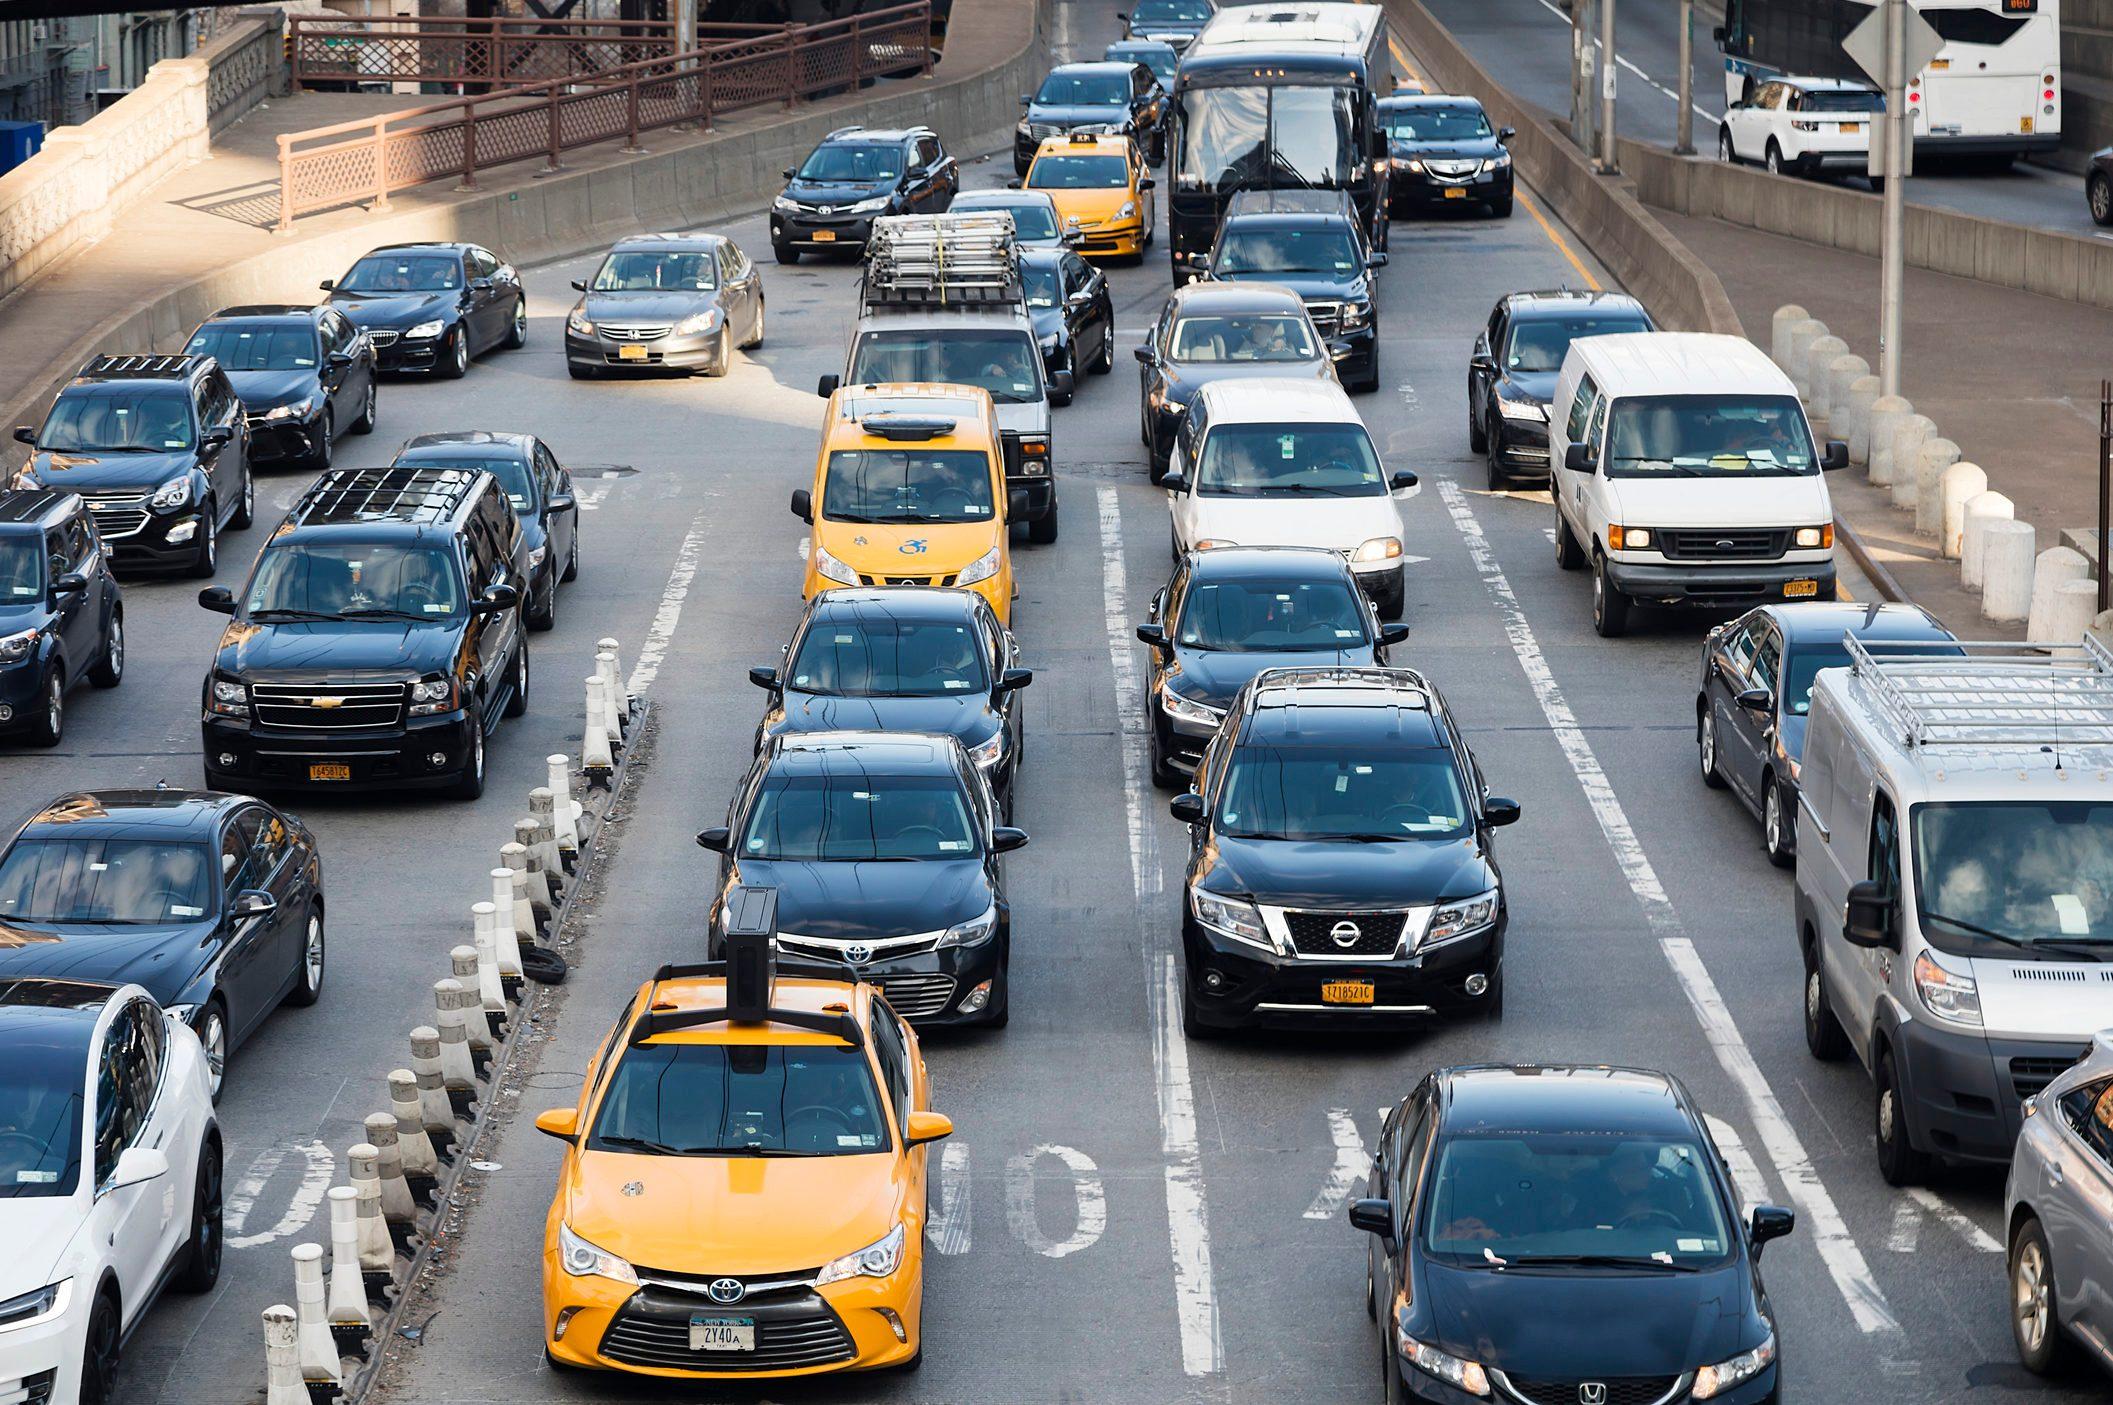 Traffic Jam Near Queensboro Bridge, New York City